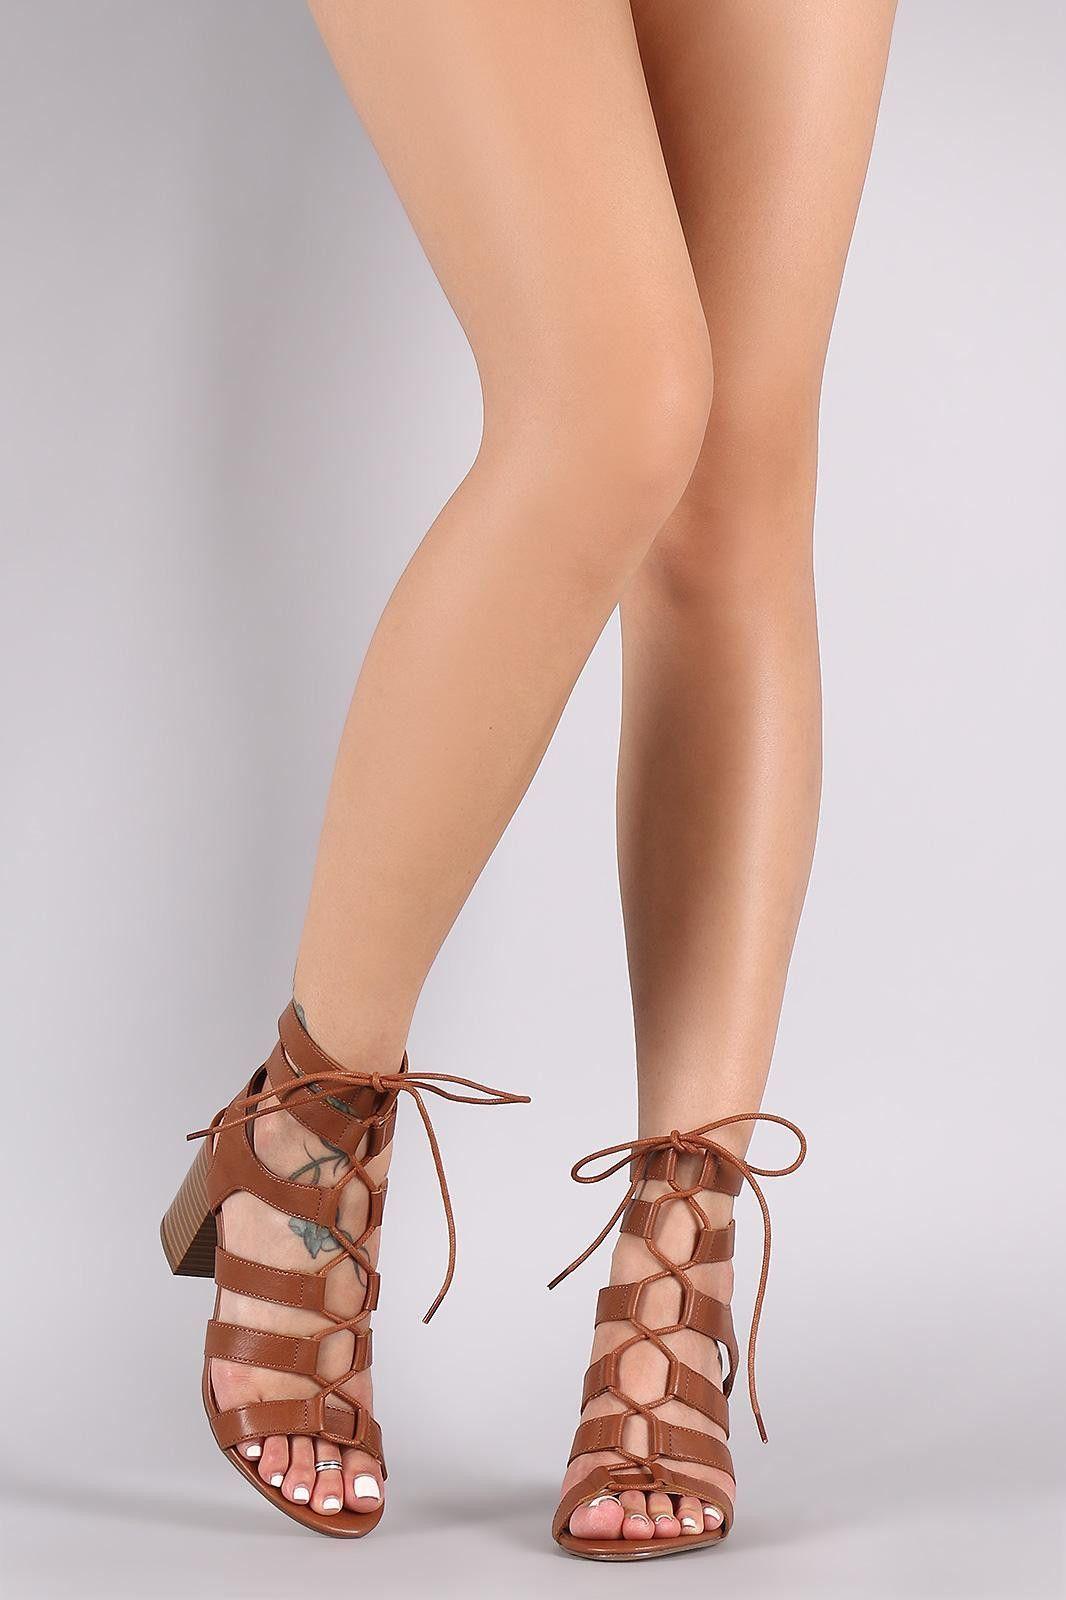 Lace Up Gladiator Chunky Heel   Chunky heels, Lace up, Heels